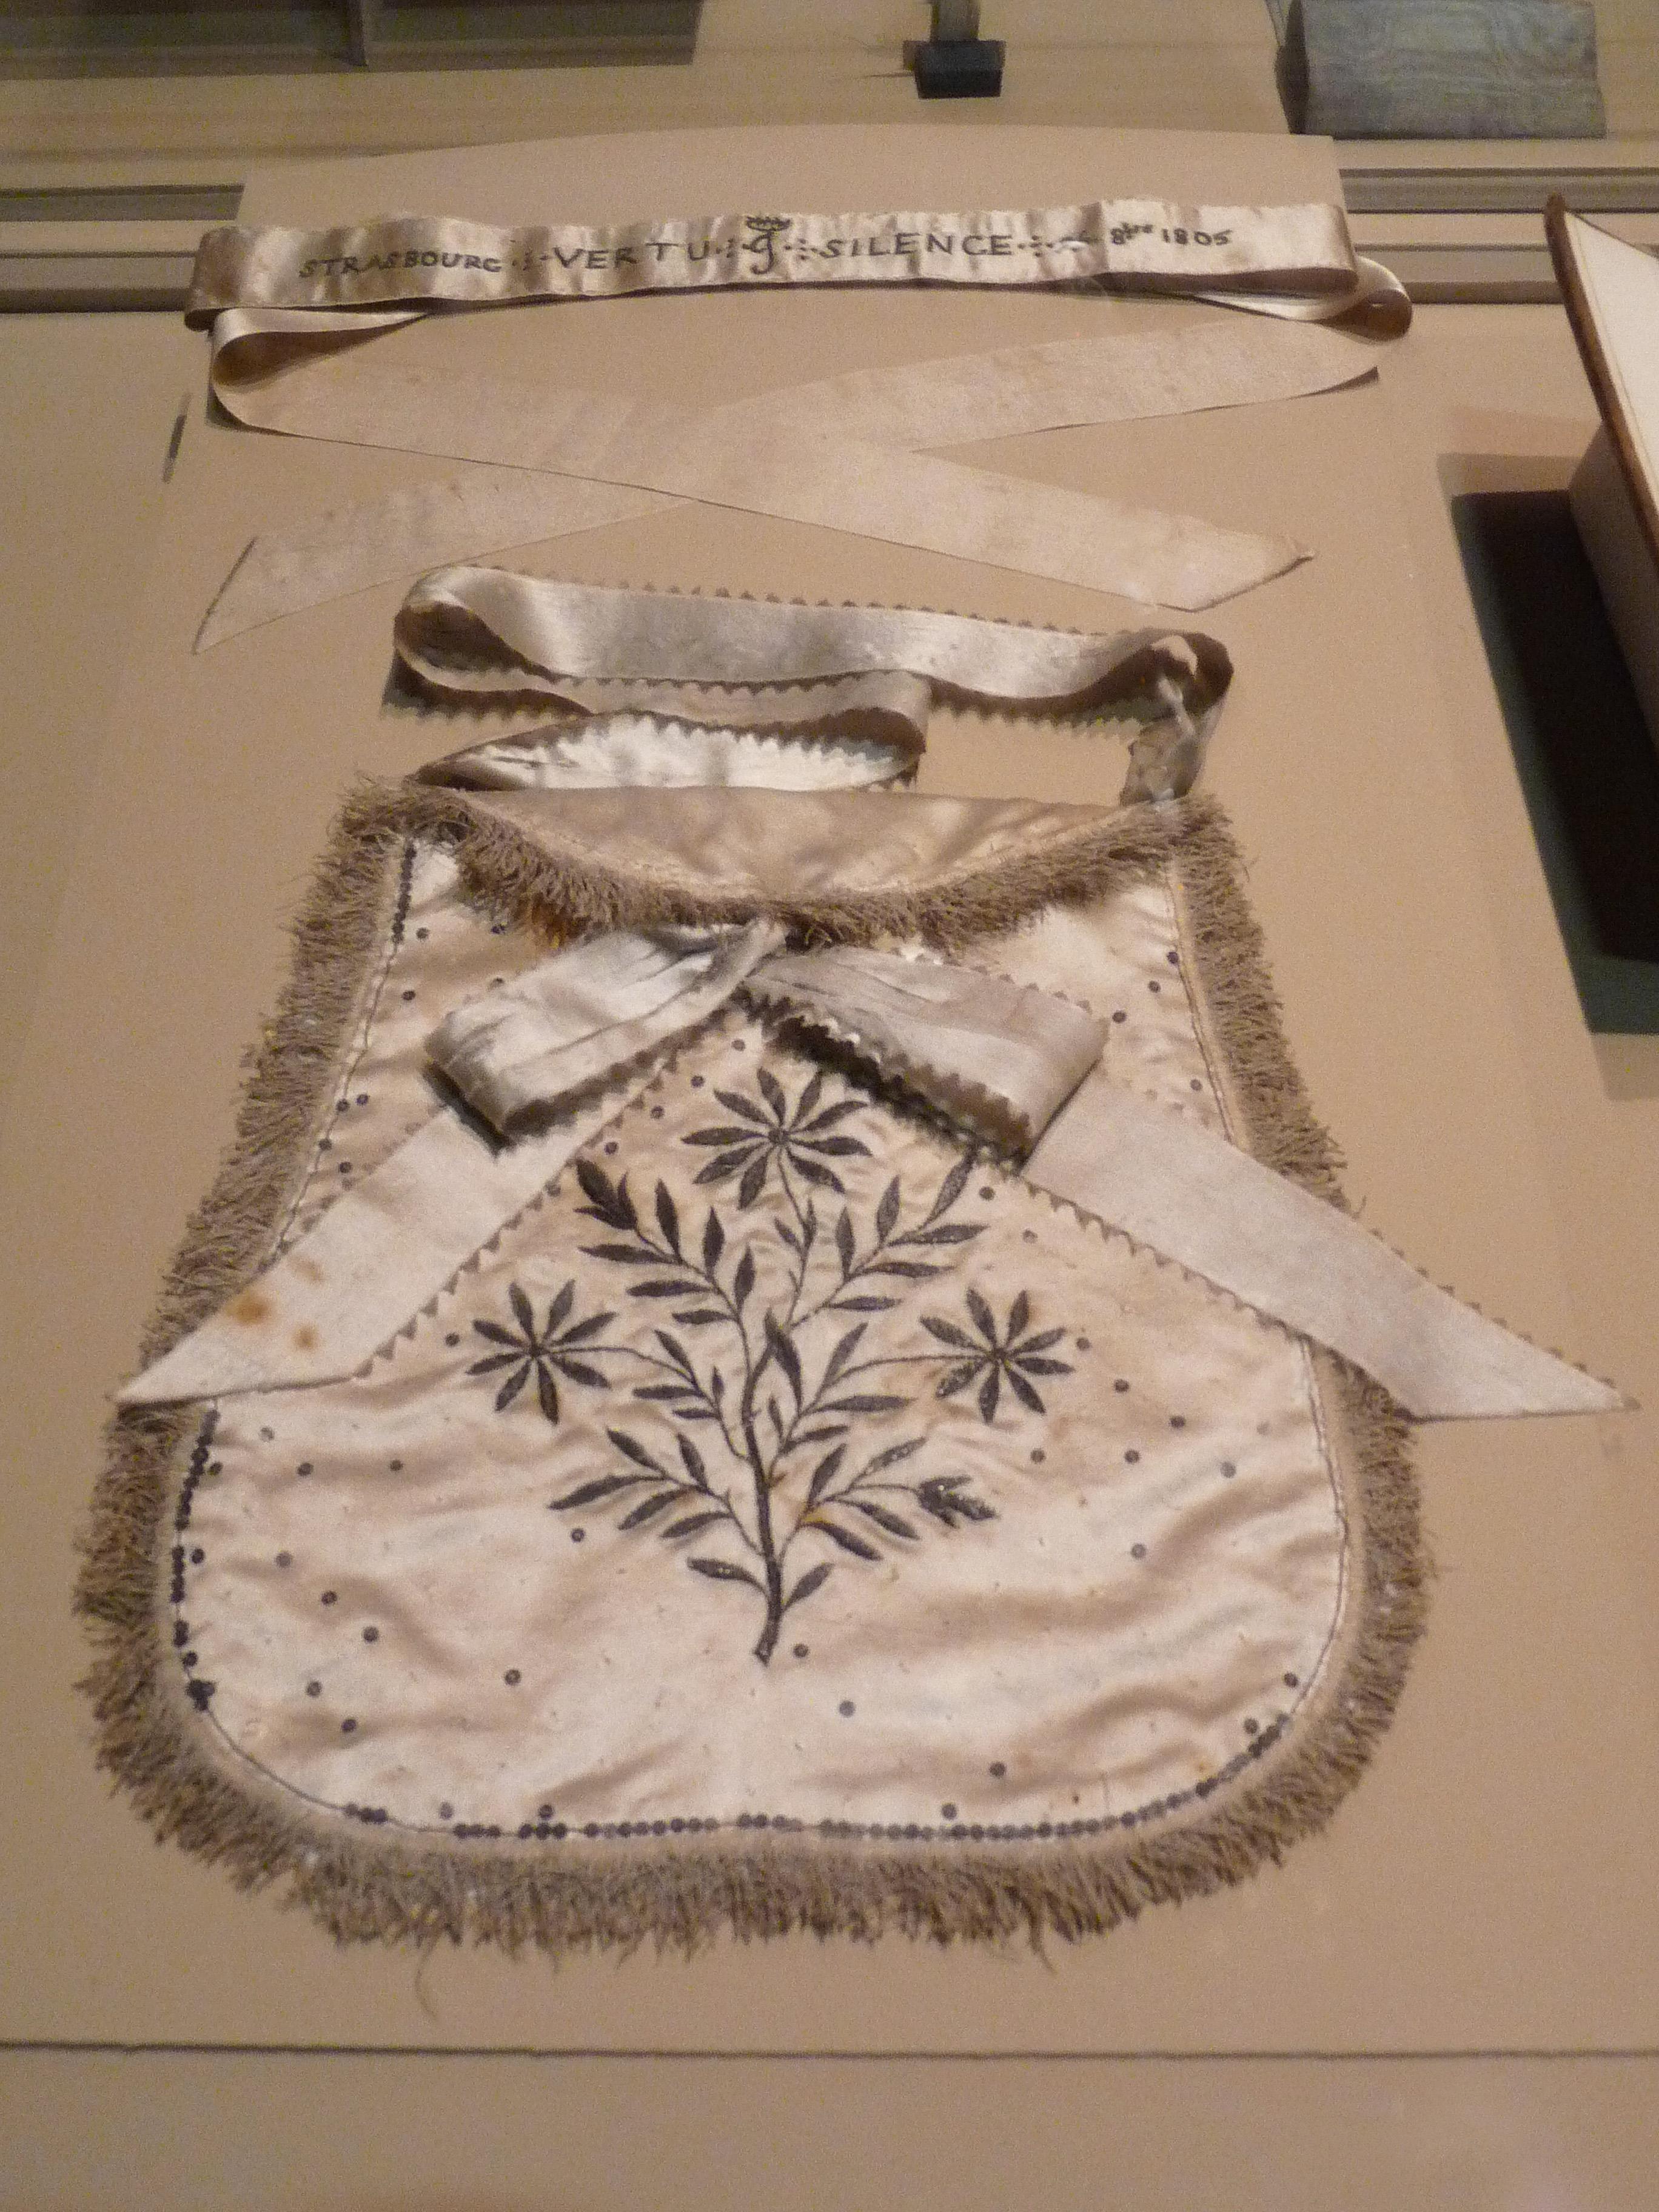 White apron edinburgh - White Apron Edinburgh 82